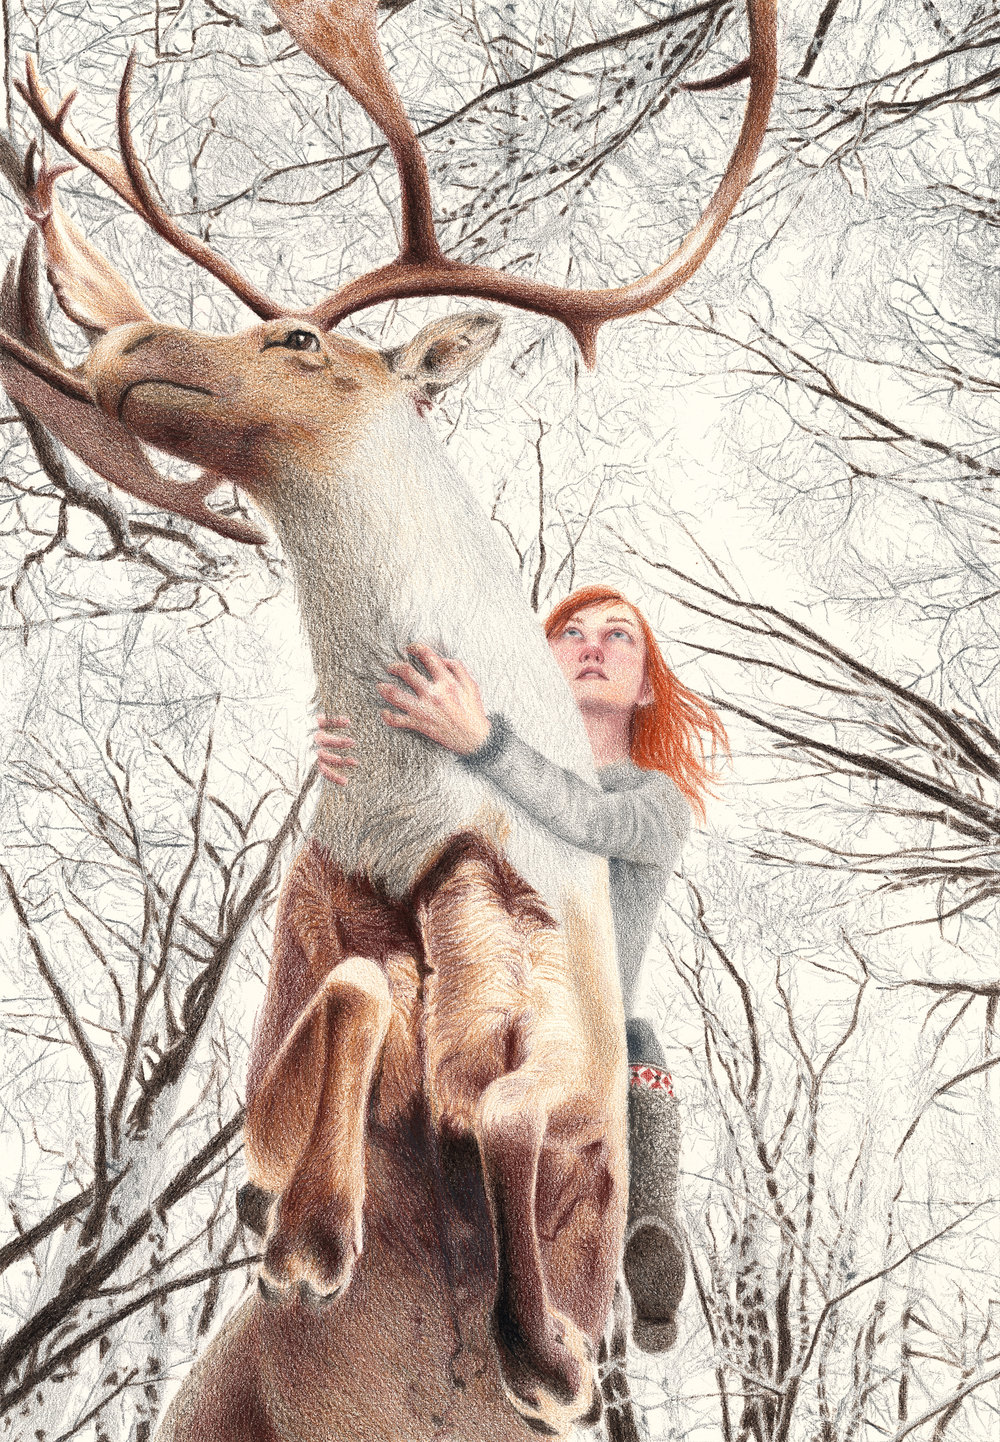 Julia_Griffin_Reindeer.jpg